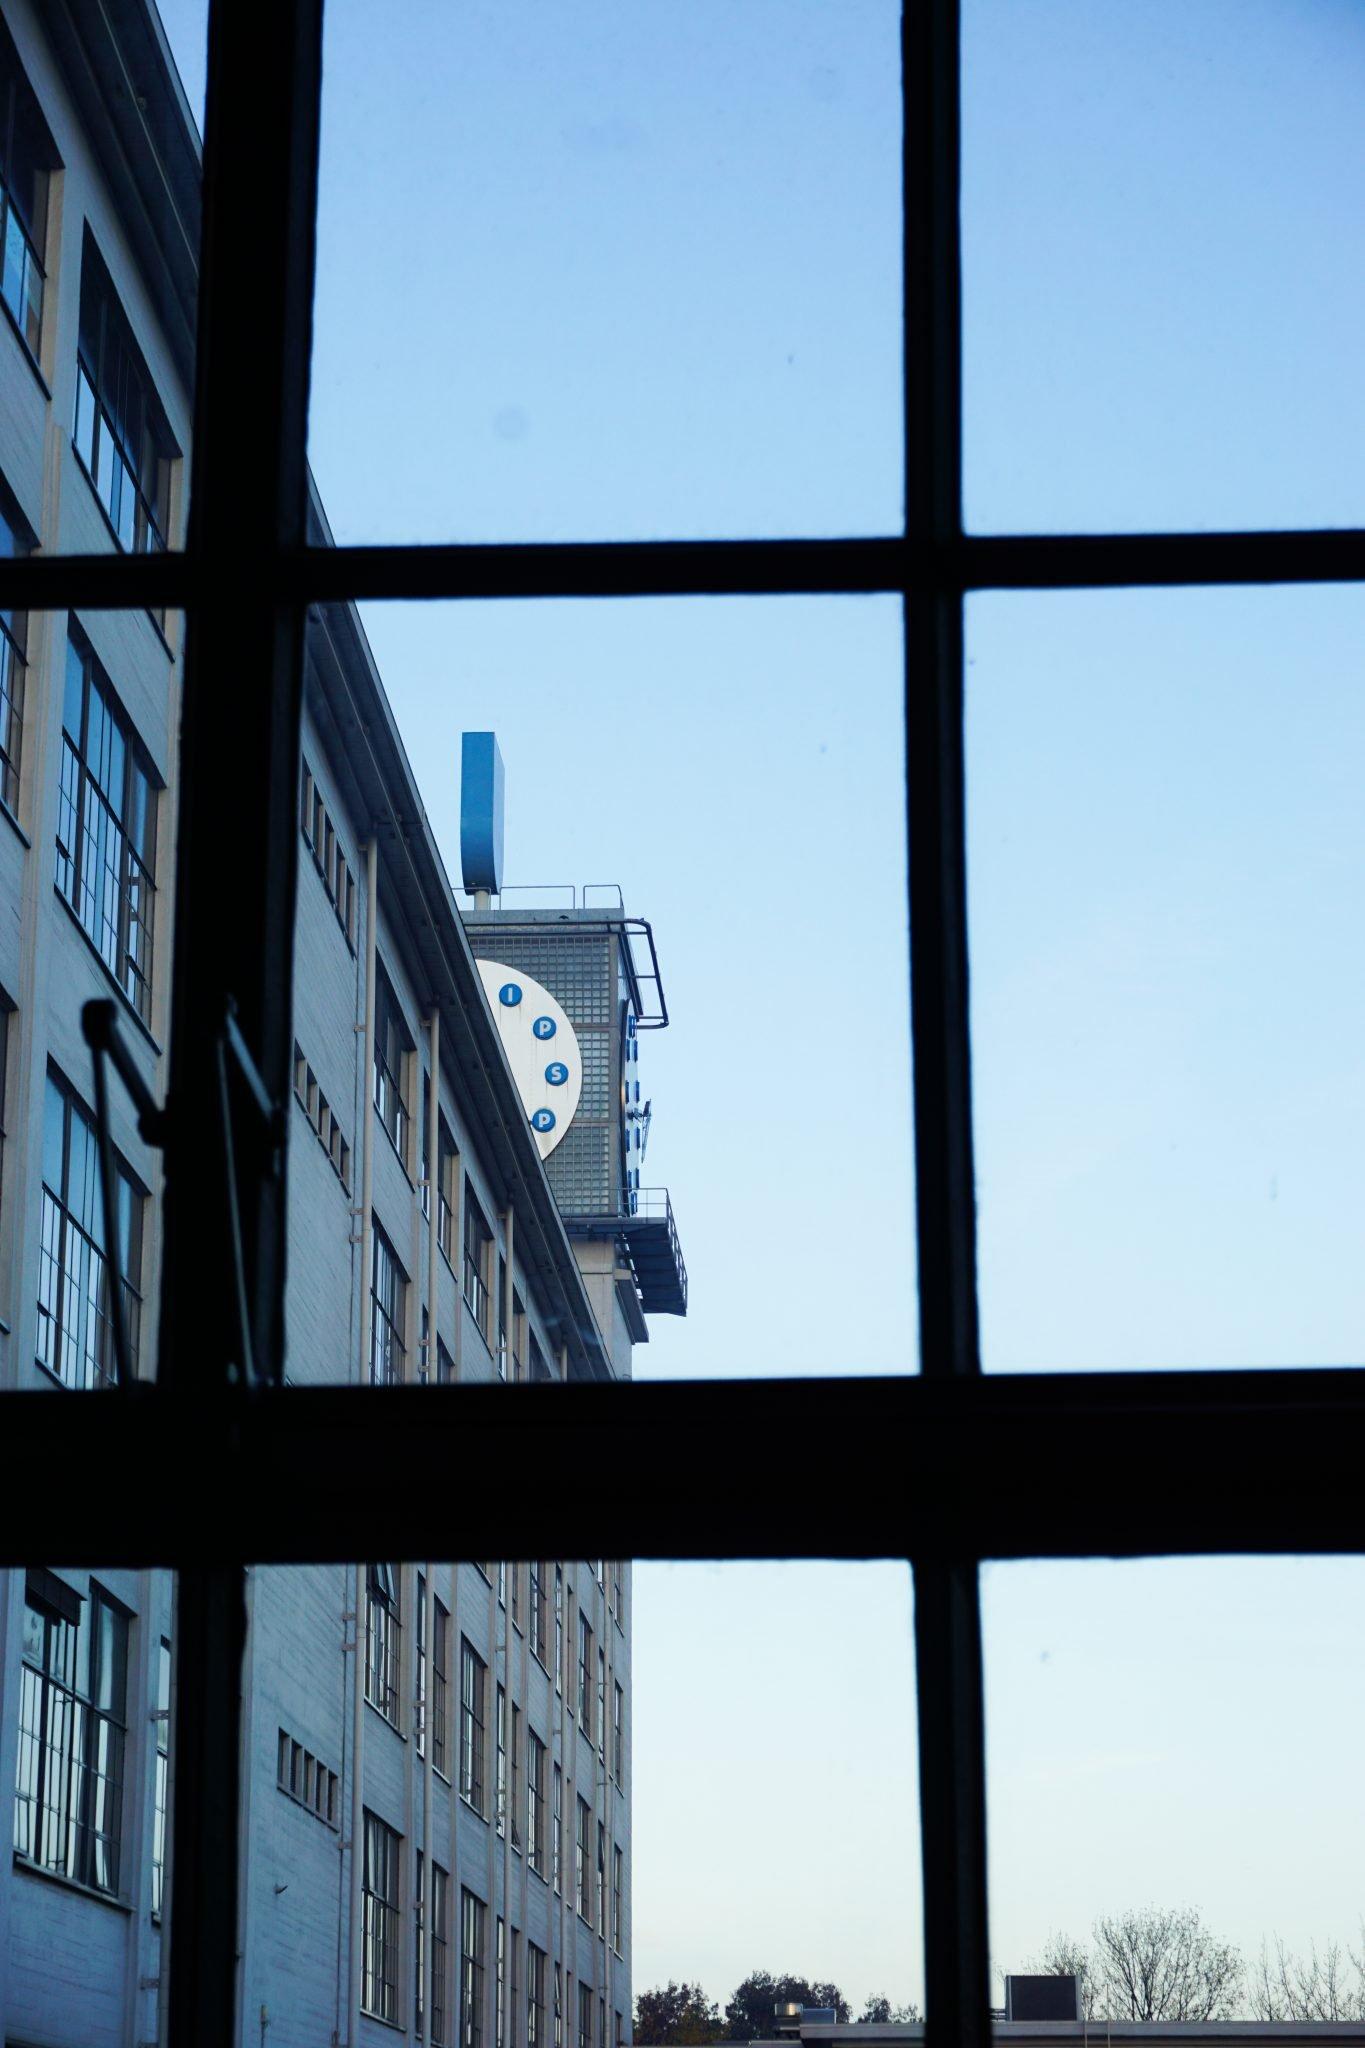 The Blue Collar Hotel